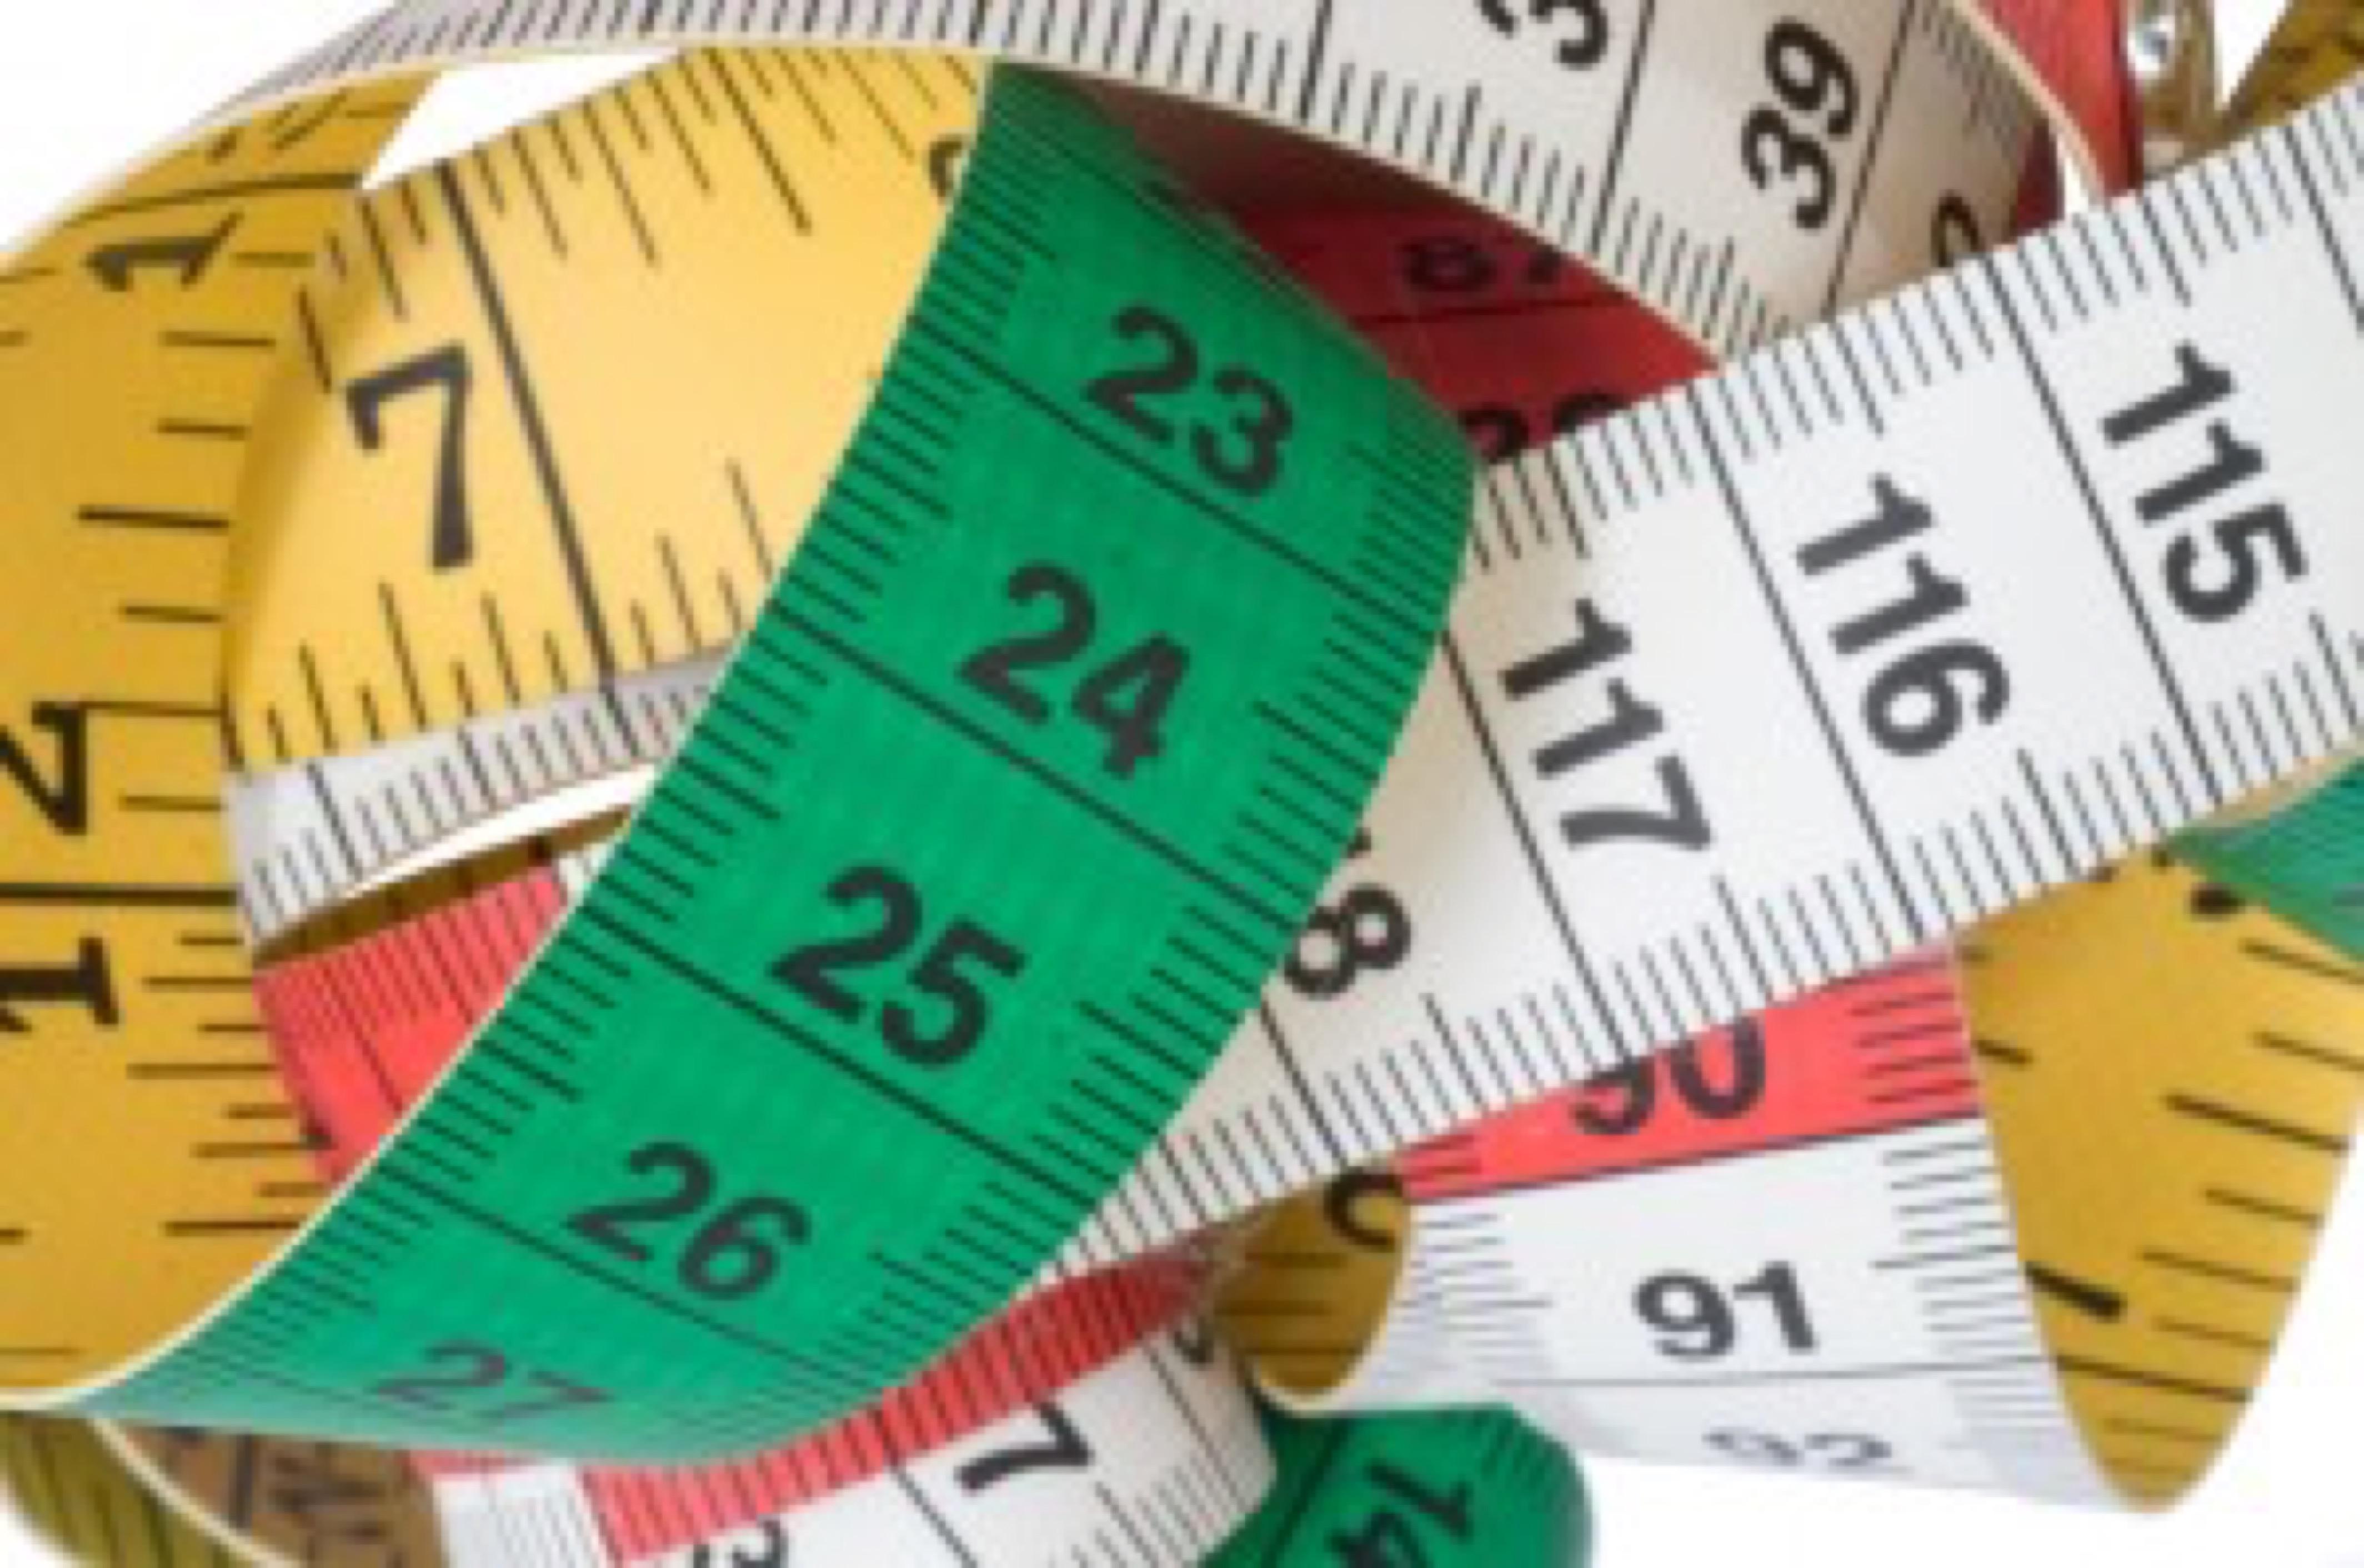 Tangled tape measure